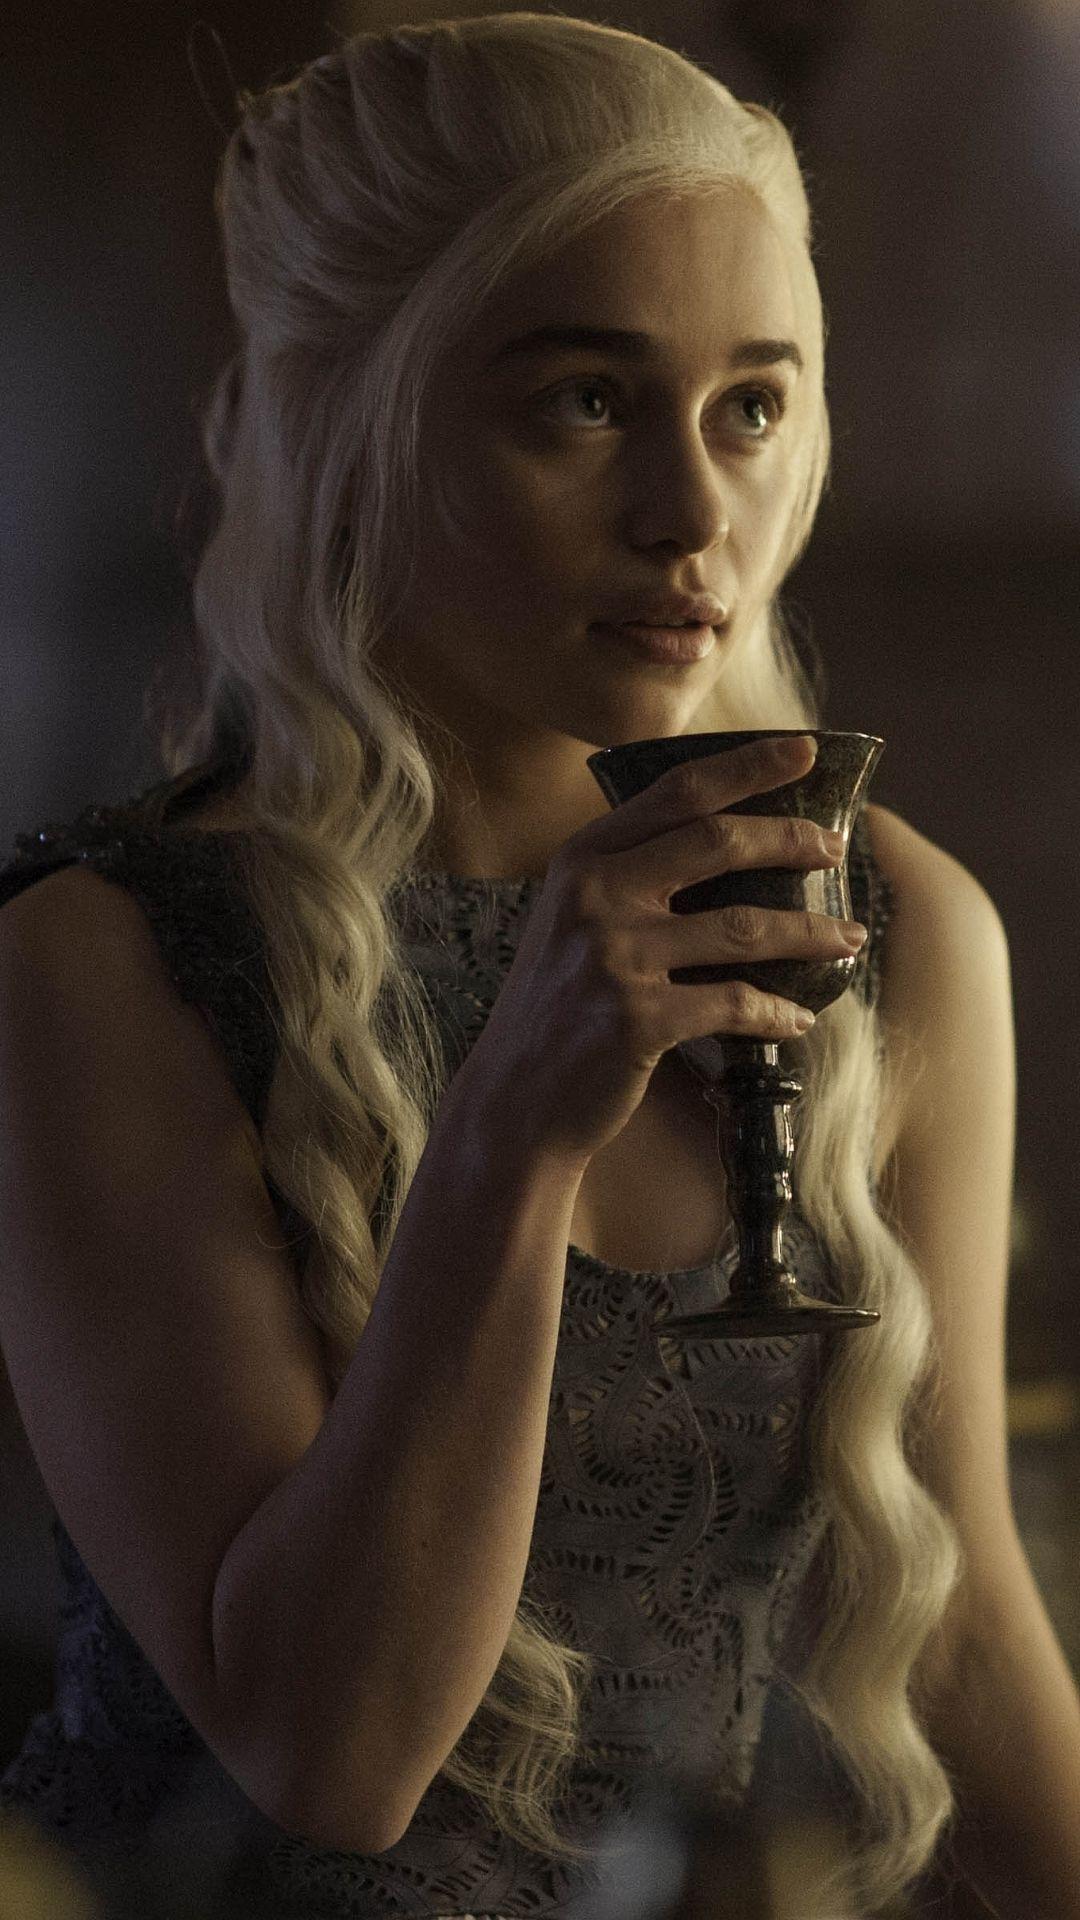 1080x1920 94 Daenerys Targaryen Apple Iphone 6 750x1334 Wallpapers Mobile Daenerys Targaryen Wallpaper Game Of Throne Daenerys Emilia Clarke